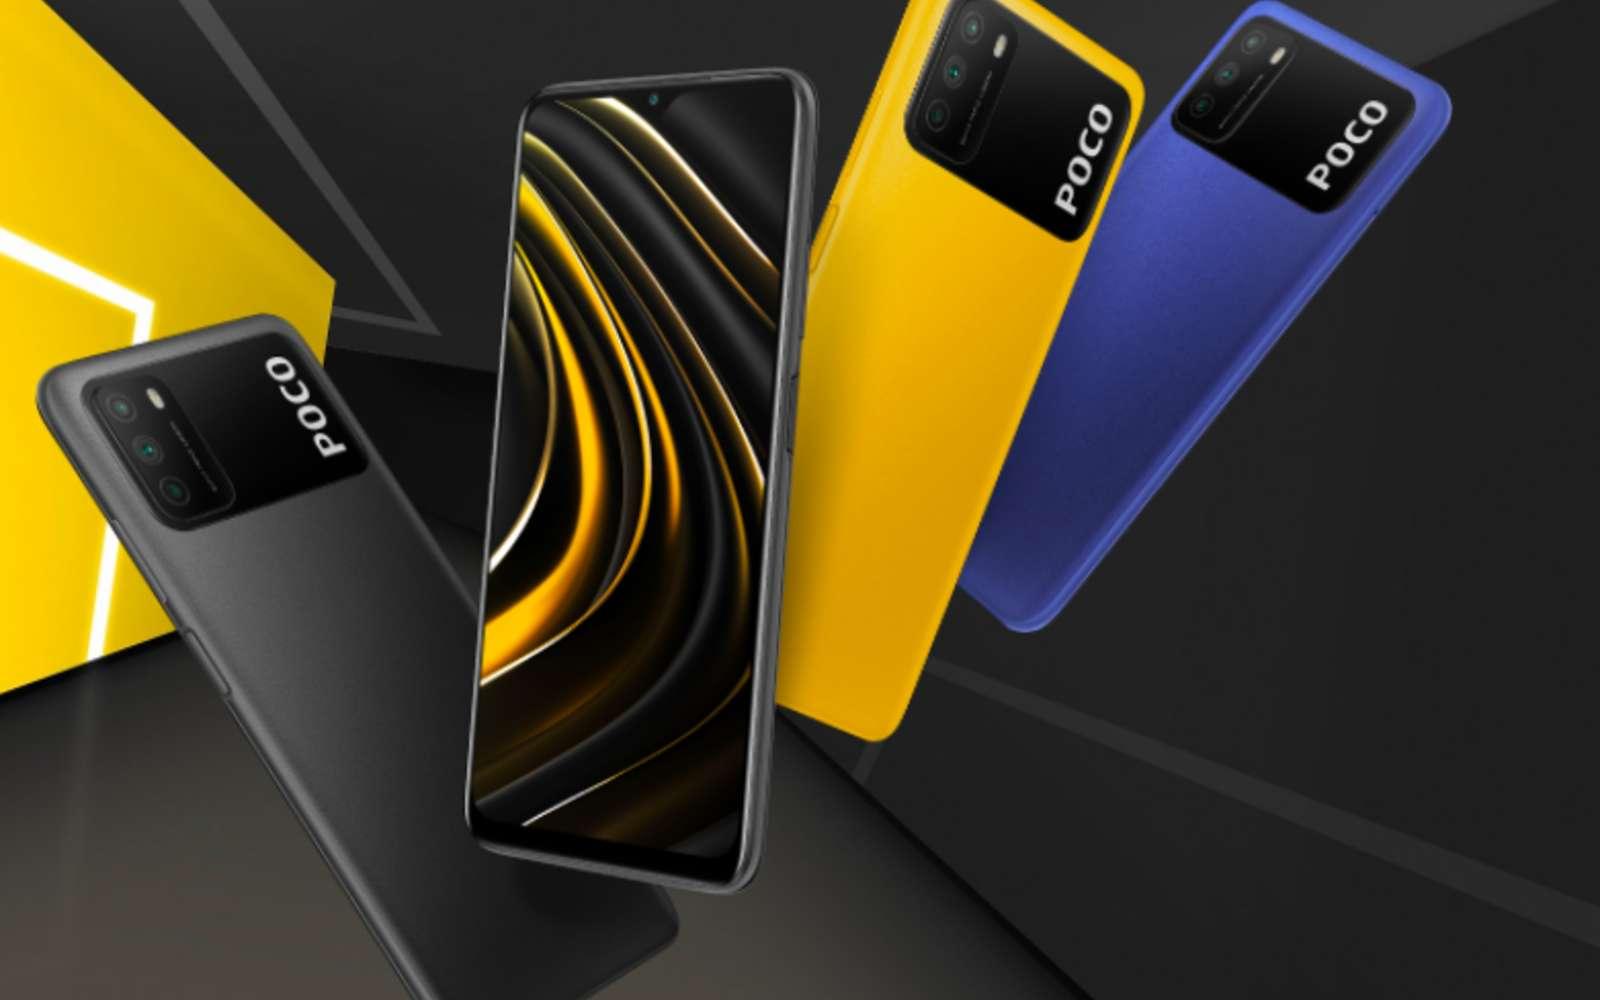 Le Xiaomi POCO M3 proposé à prix cassé © AliExpress